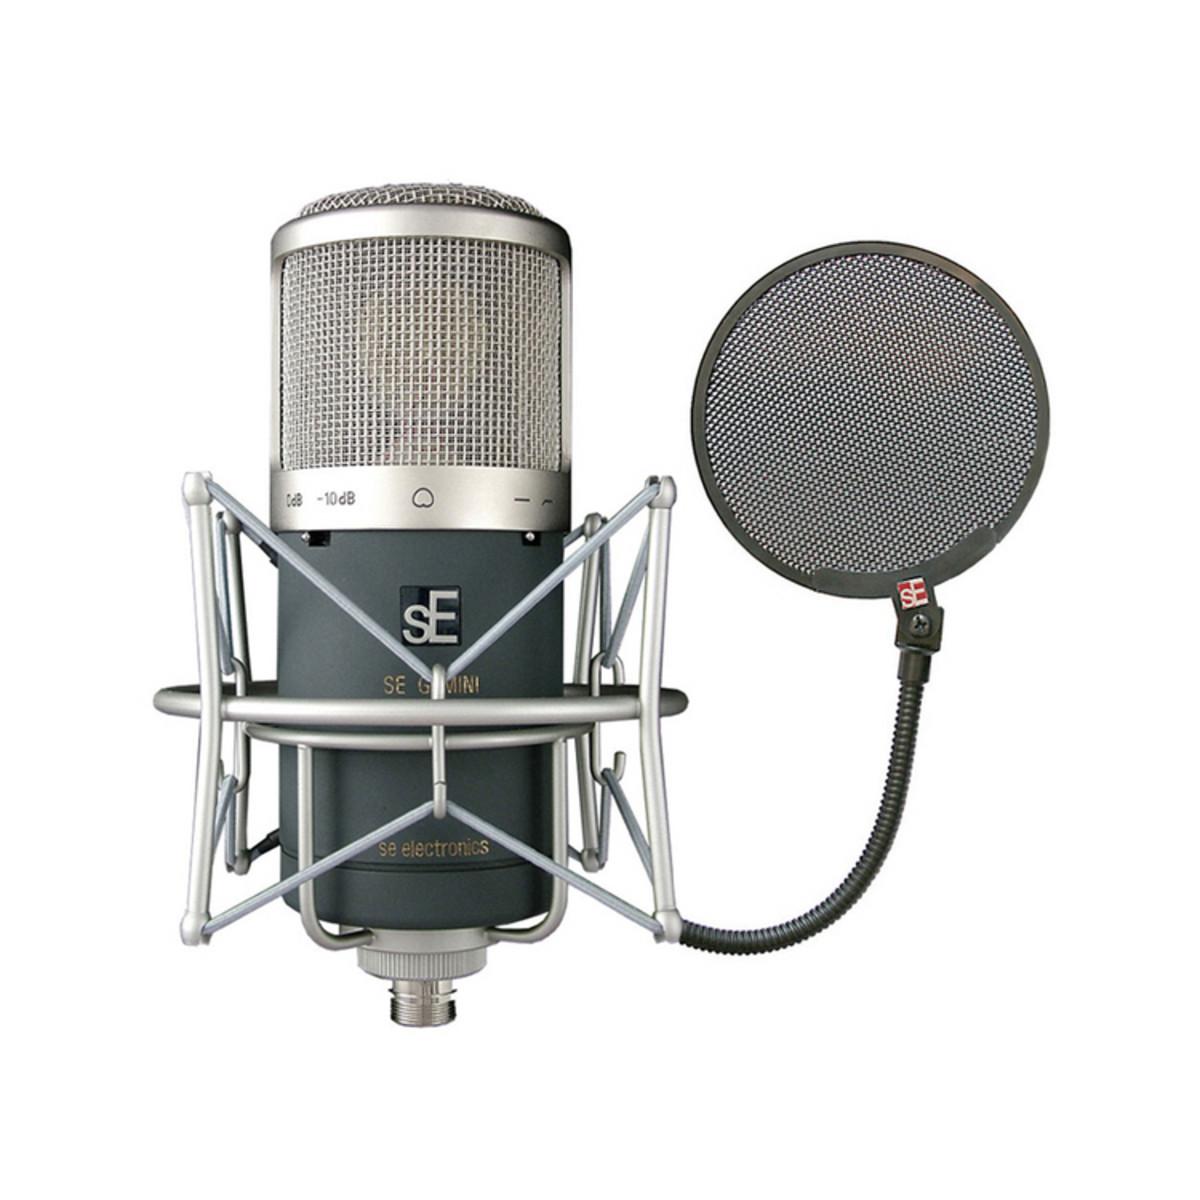 OFFLINEsE Electronics Gemini II Dual Tube Mic +FREE sE Pop Shield at Gear4music